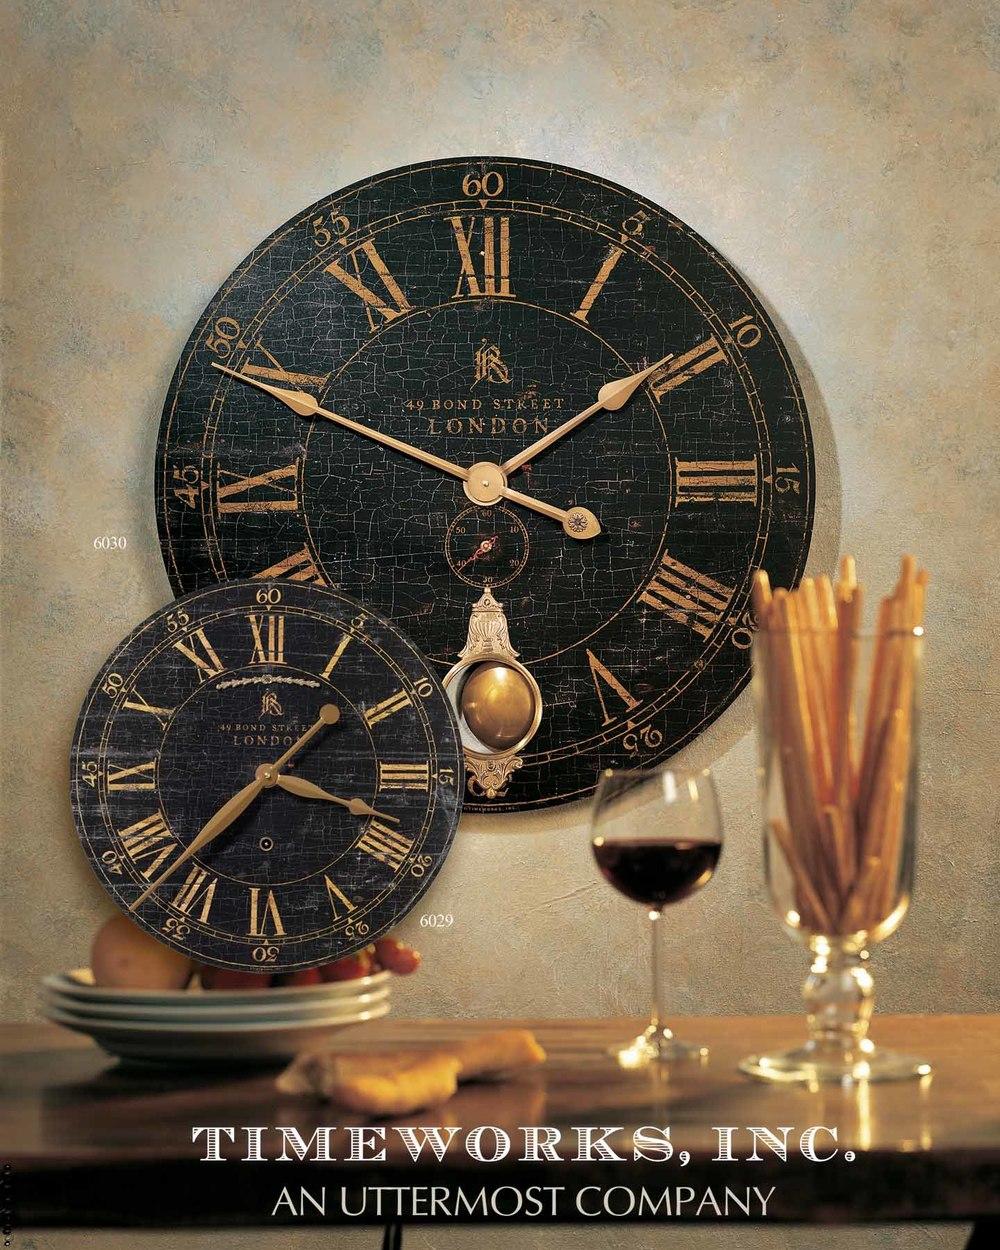 Uttermost Company - Bond Street Wall Clock